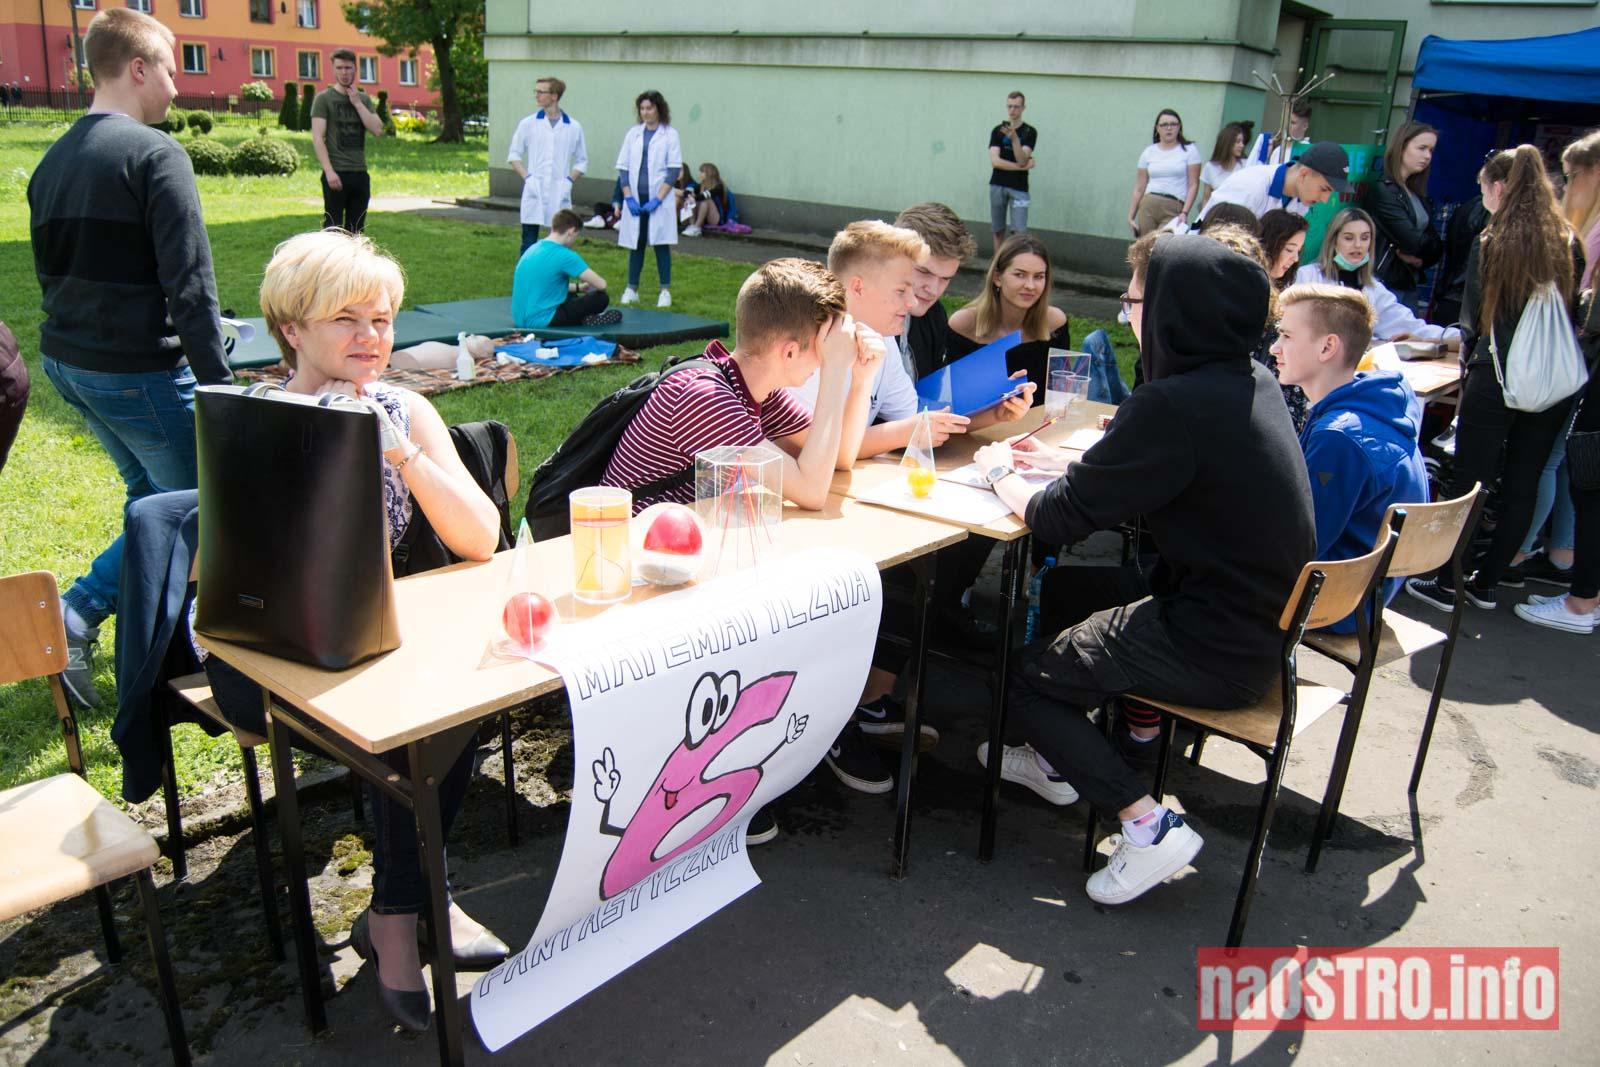 NaOSTRO Piknik u Staszka-11